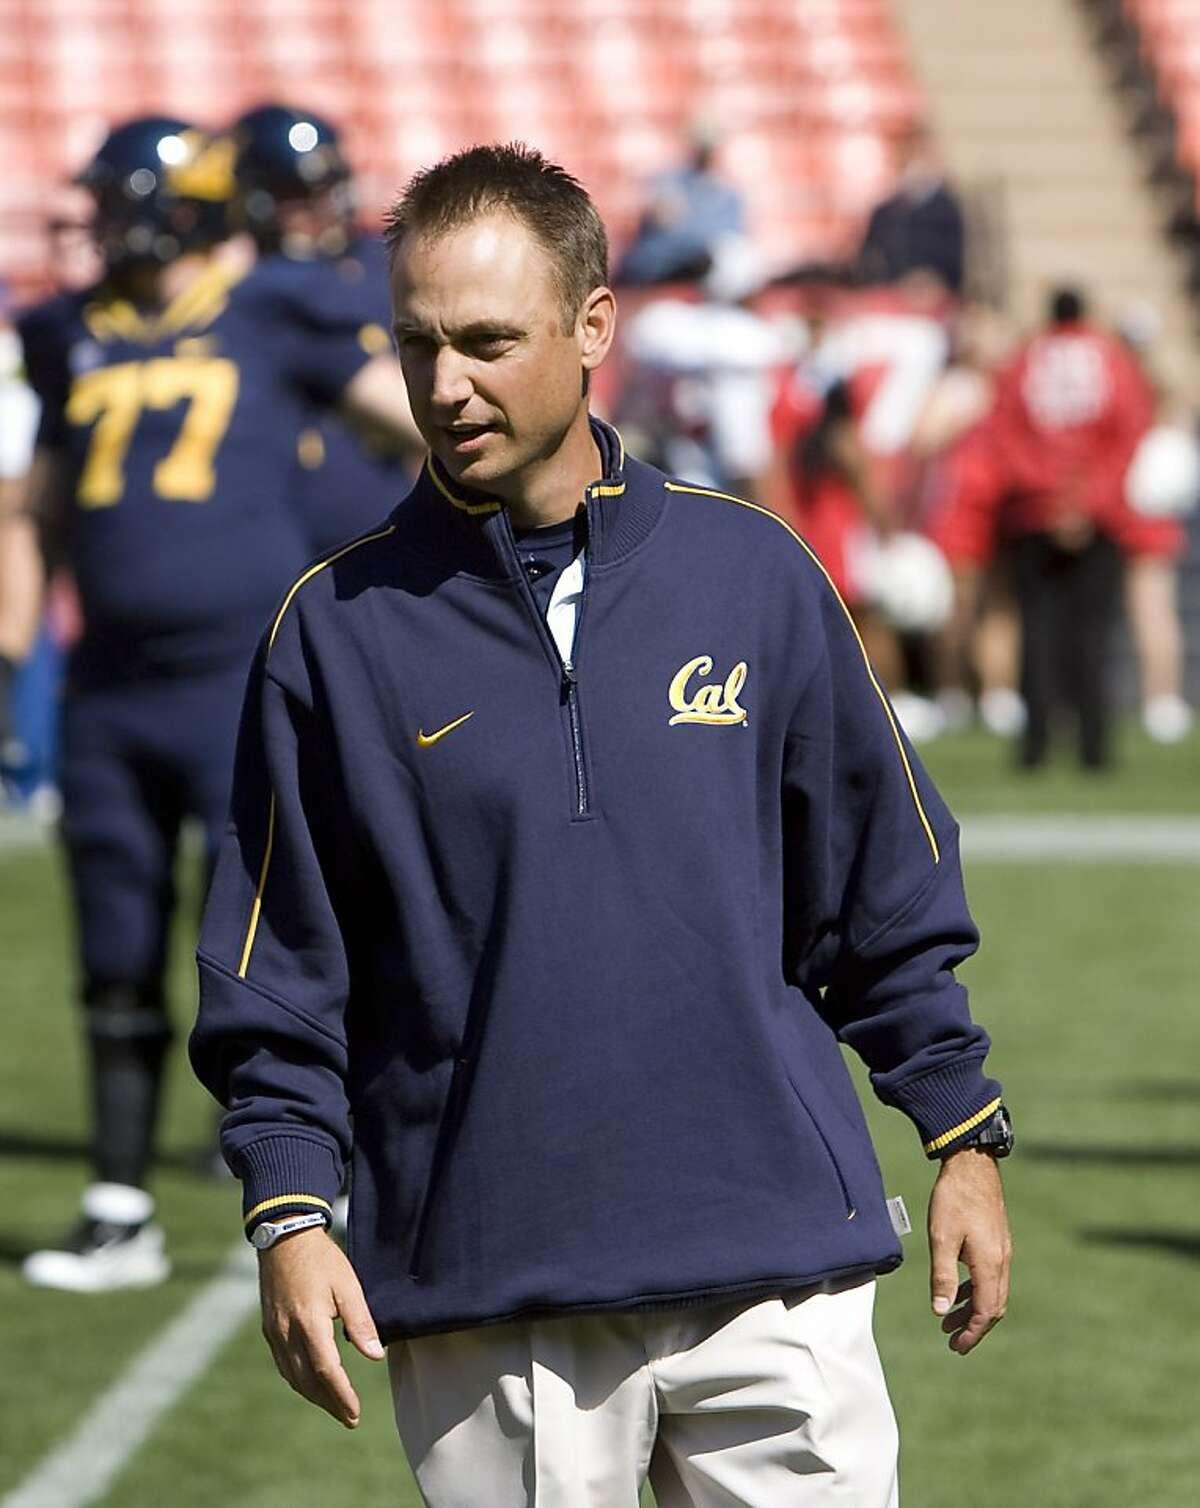 Eric Kiesau, Cal assistant football coach, Sept. 3, 2011.